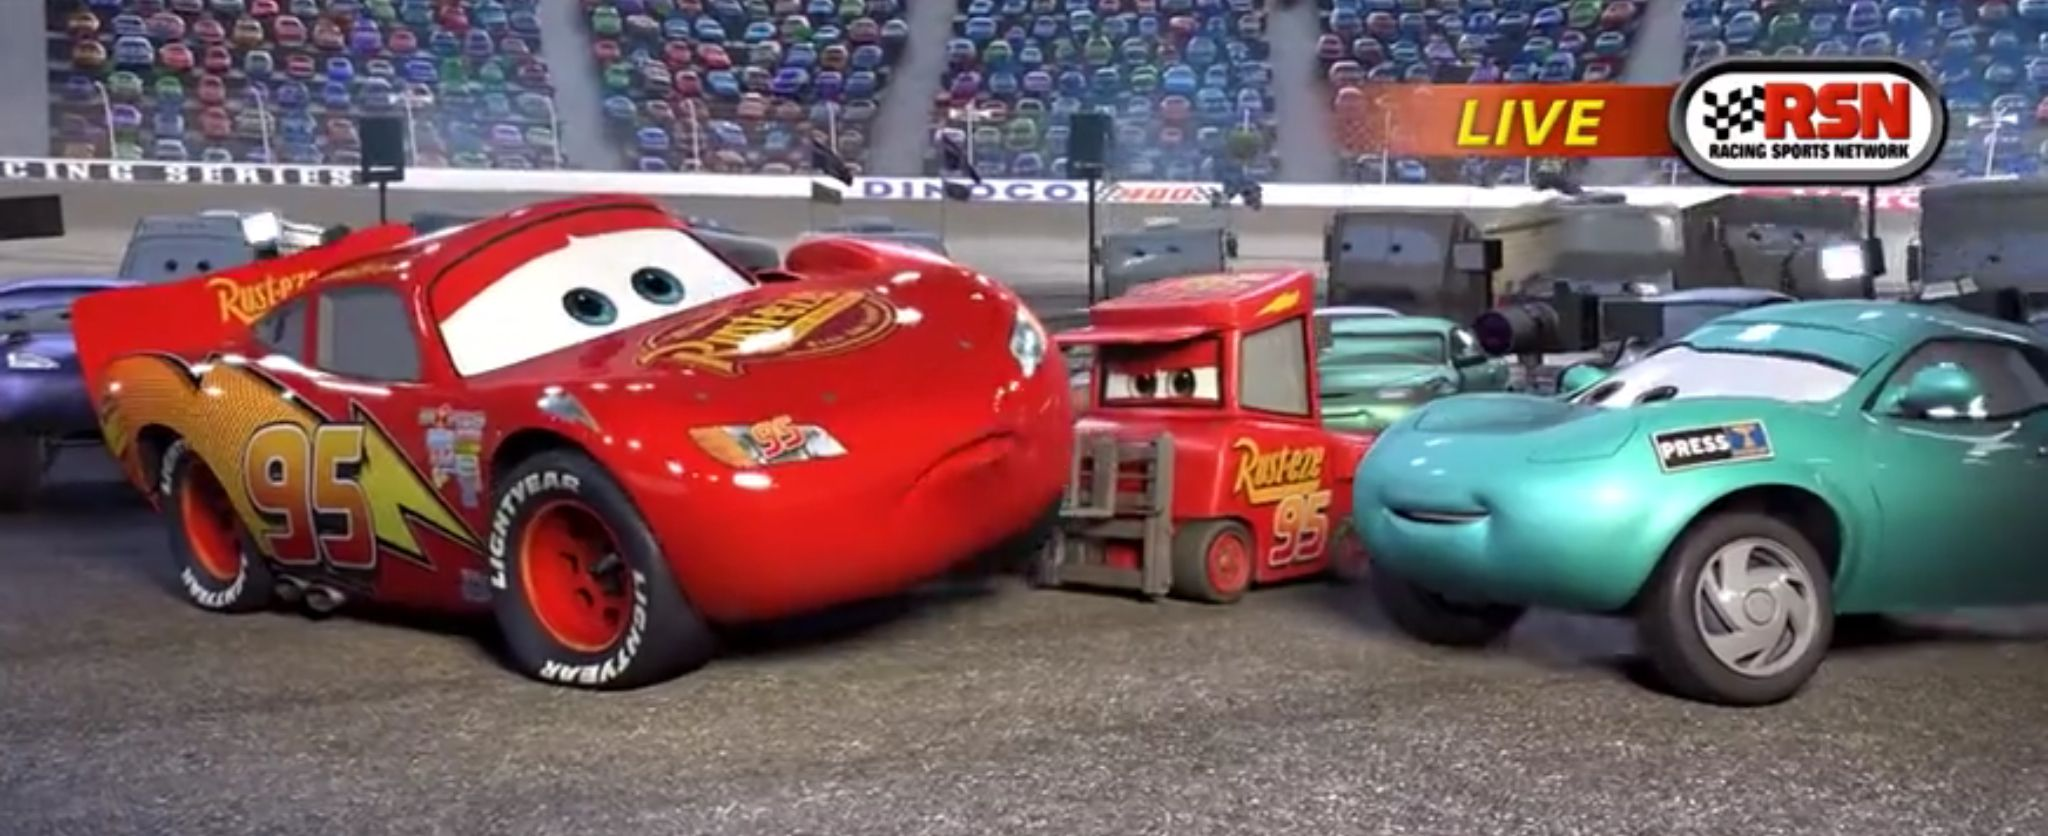 Pin De Jeffrey Gayle Hay Em Cars Carros Da Disney Disney Pixar Pixar